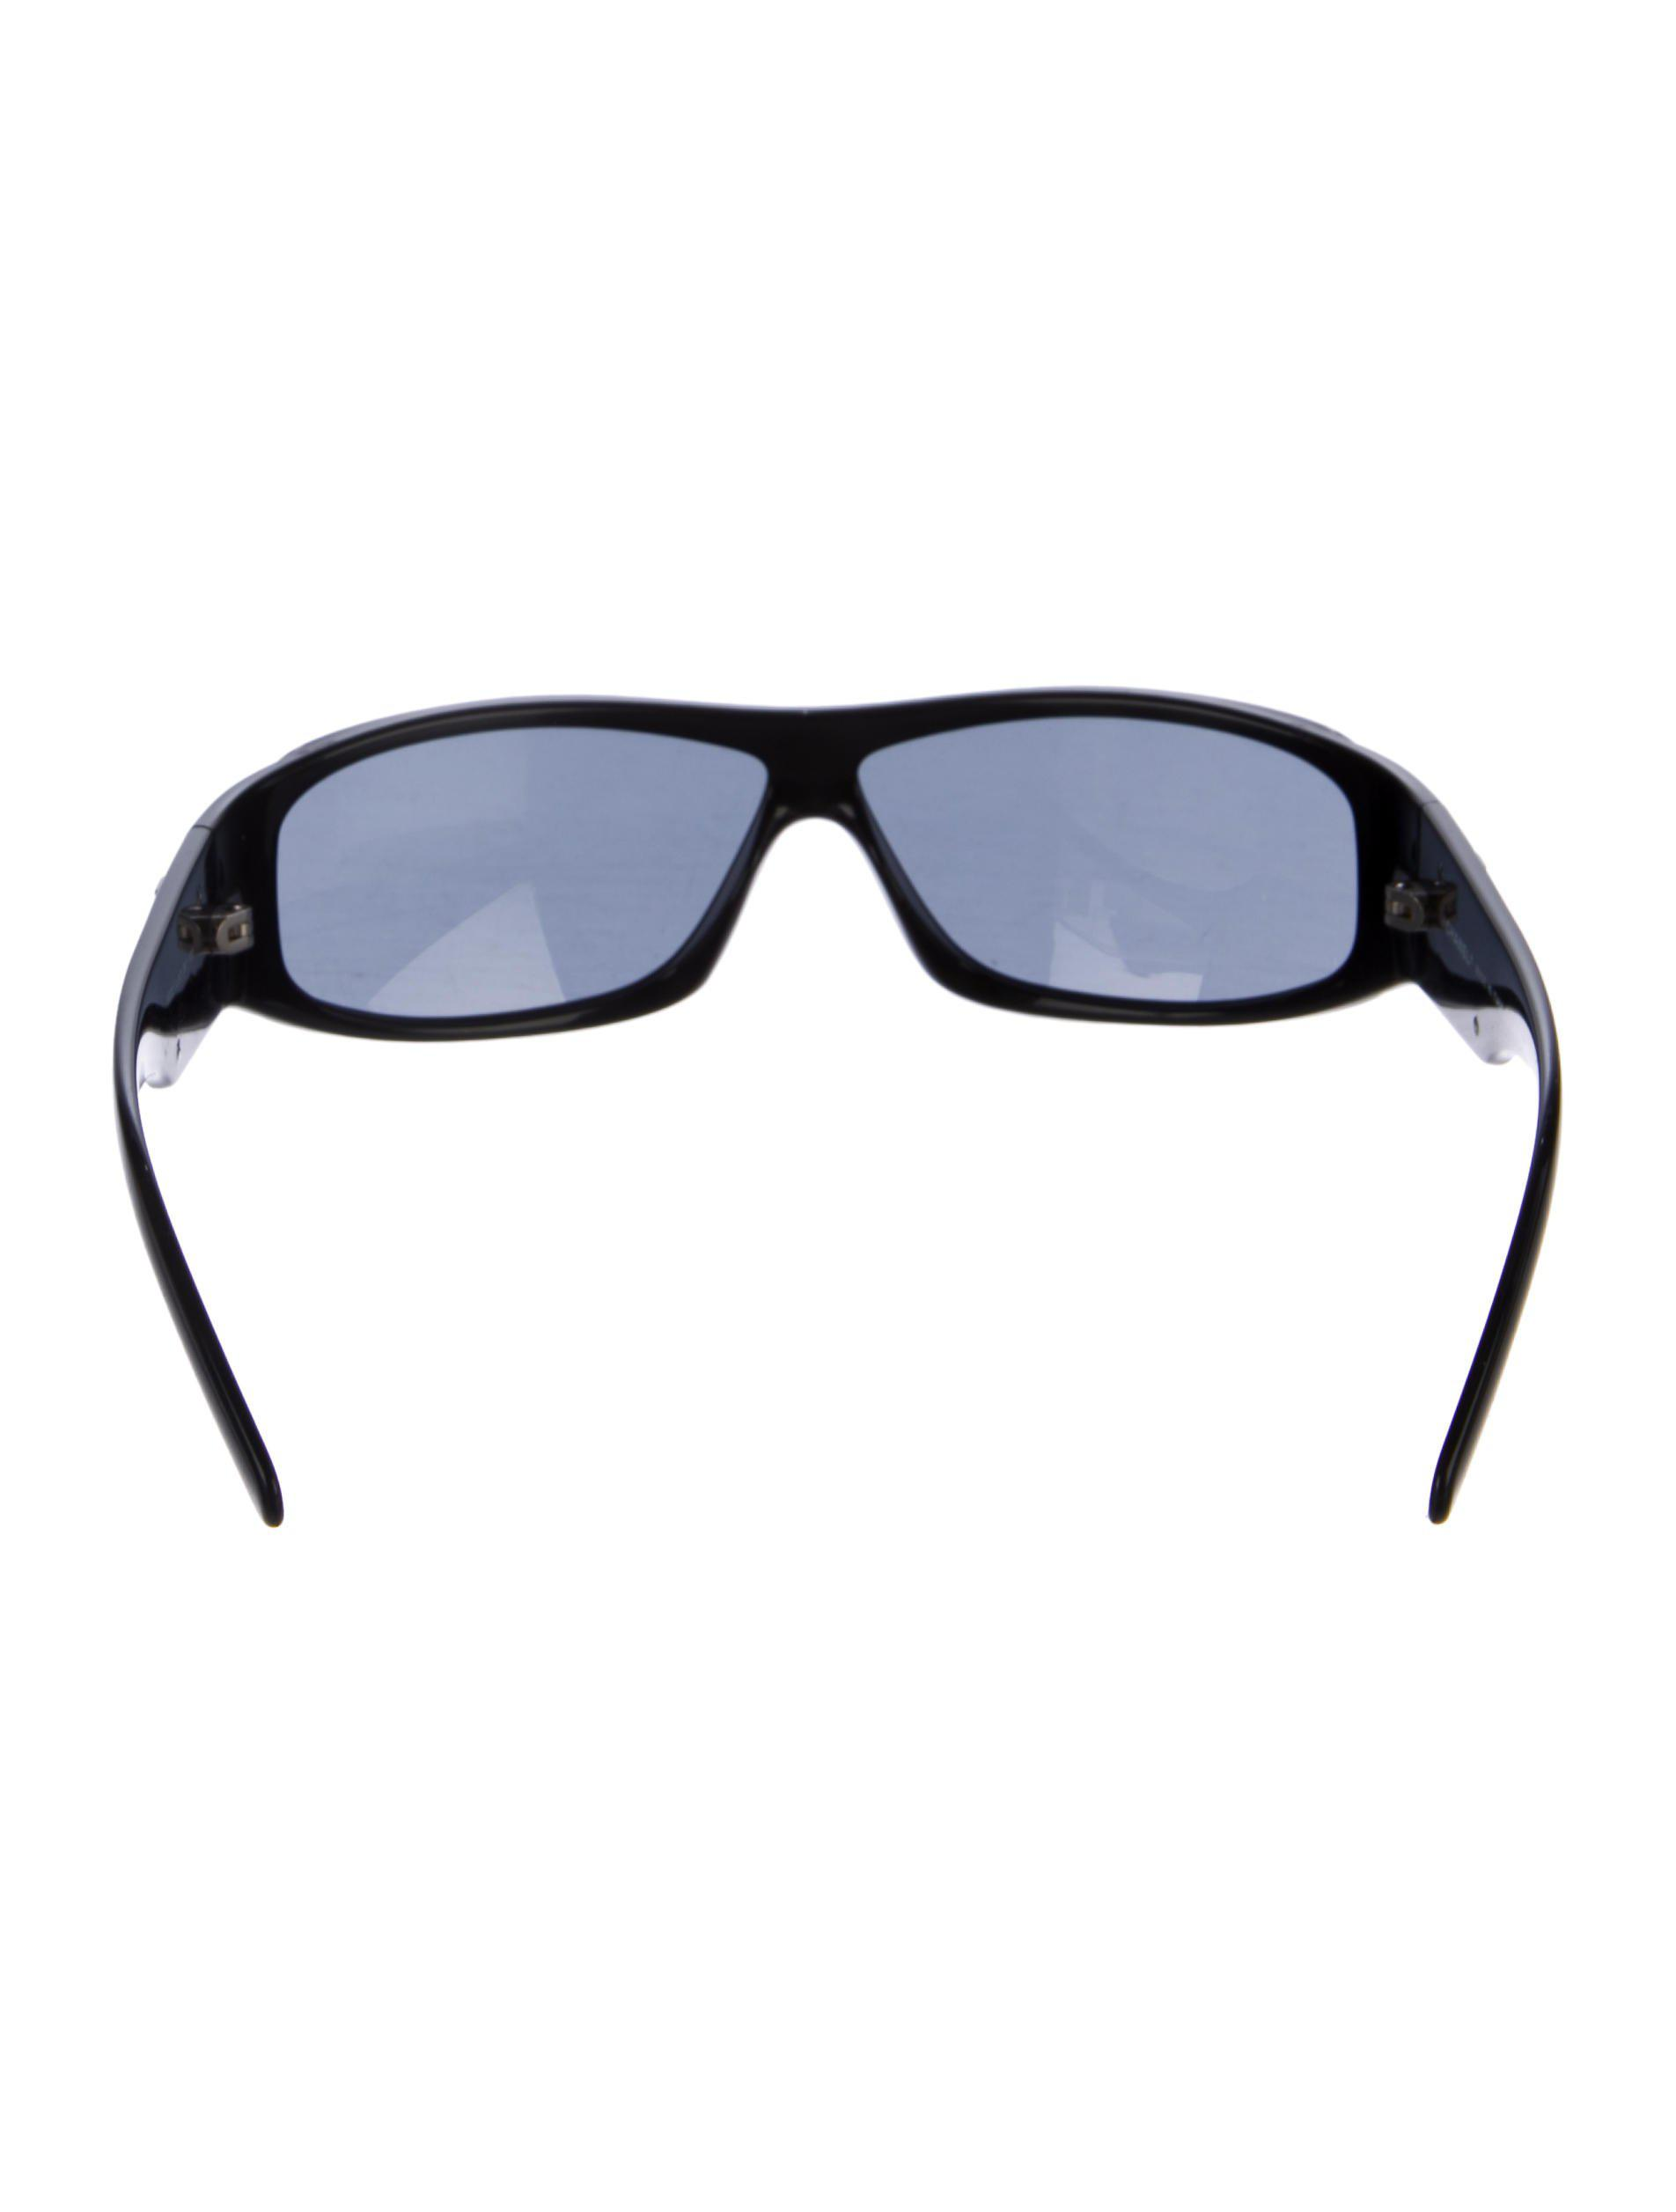 4bd827cc946dc Lyst - Chanel Cc Shield Sunglasses Black in Metallic